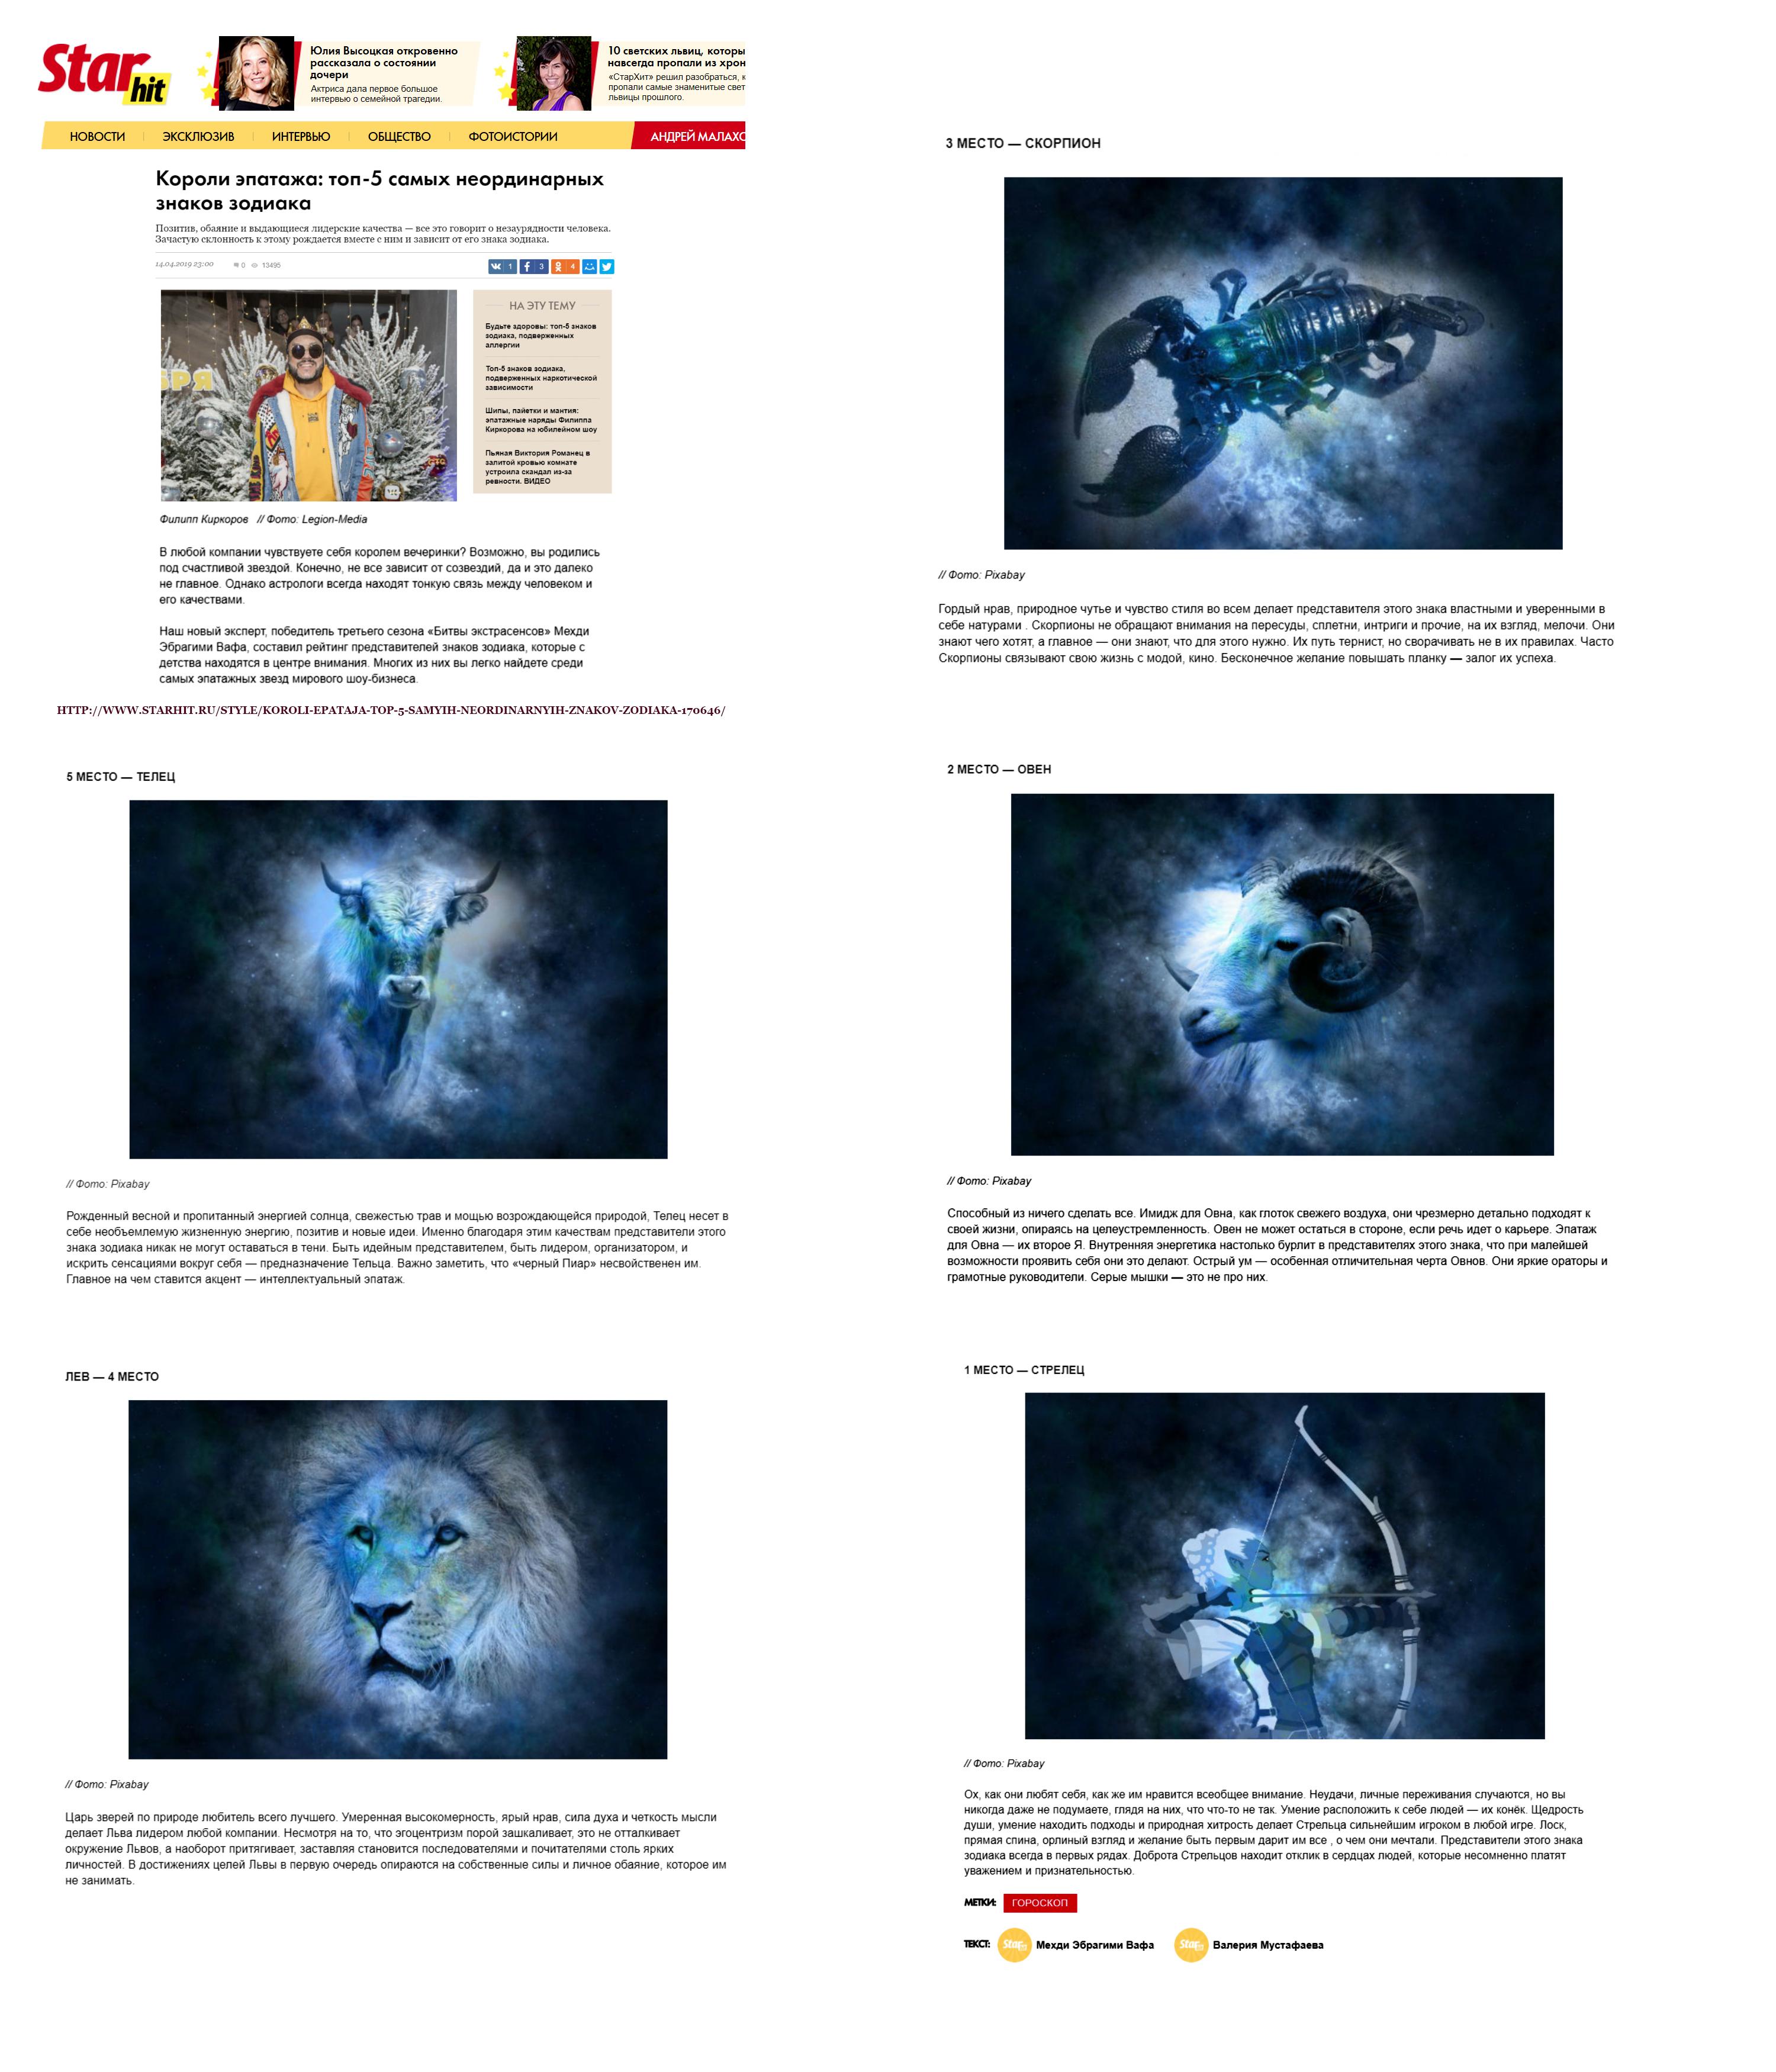 Короли эпатажа: топ-5 самых неординарных знаков зодиака. STARHIT/ Мехди Эбрагими Вафа